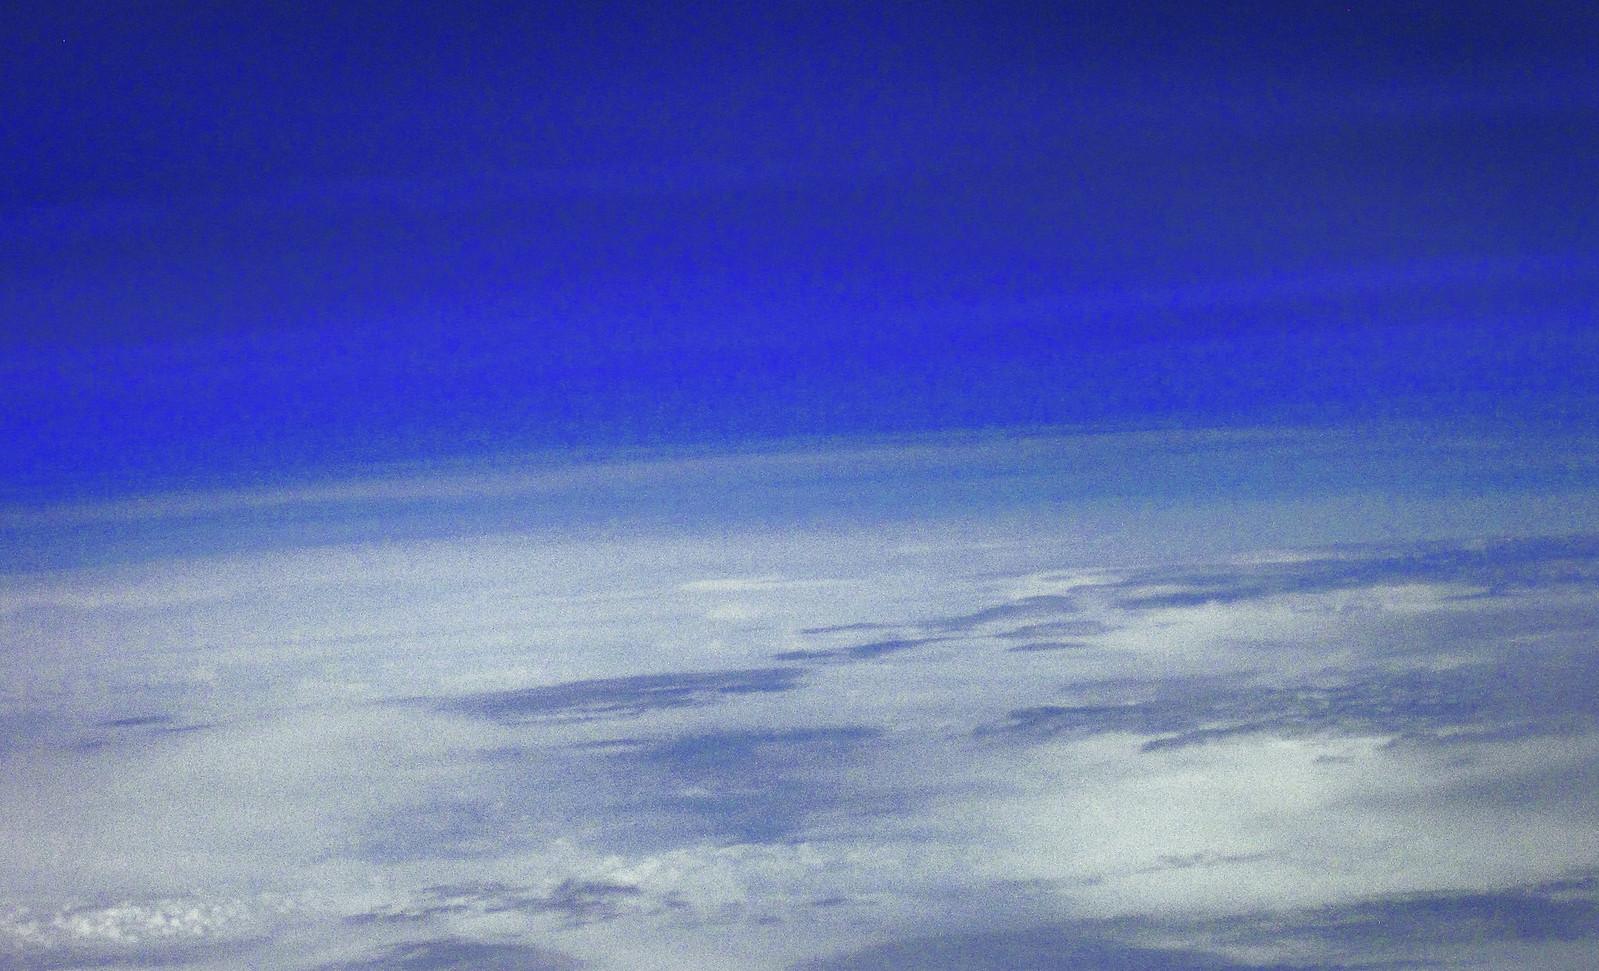 aérea cielo 02